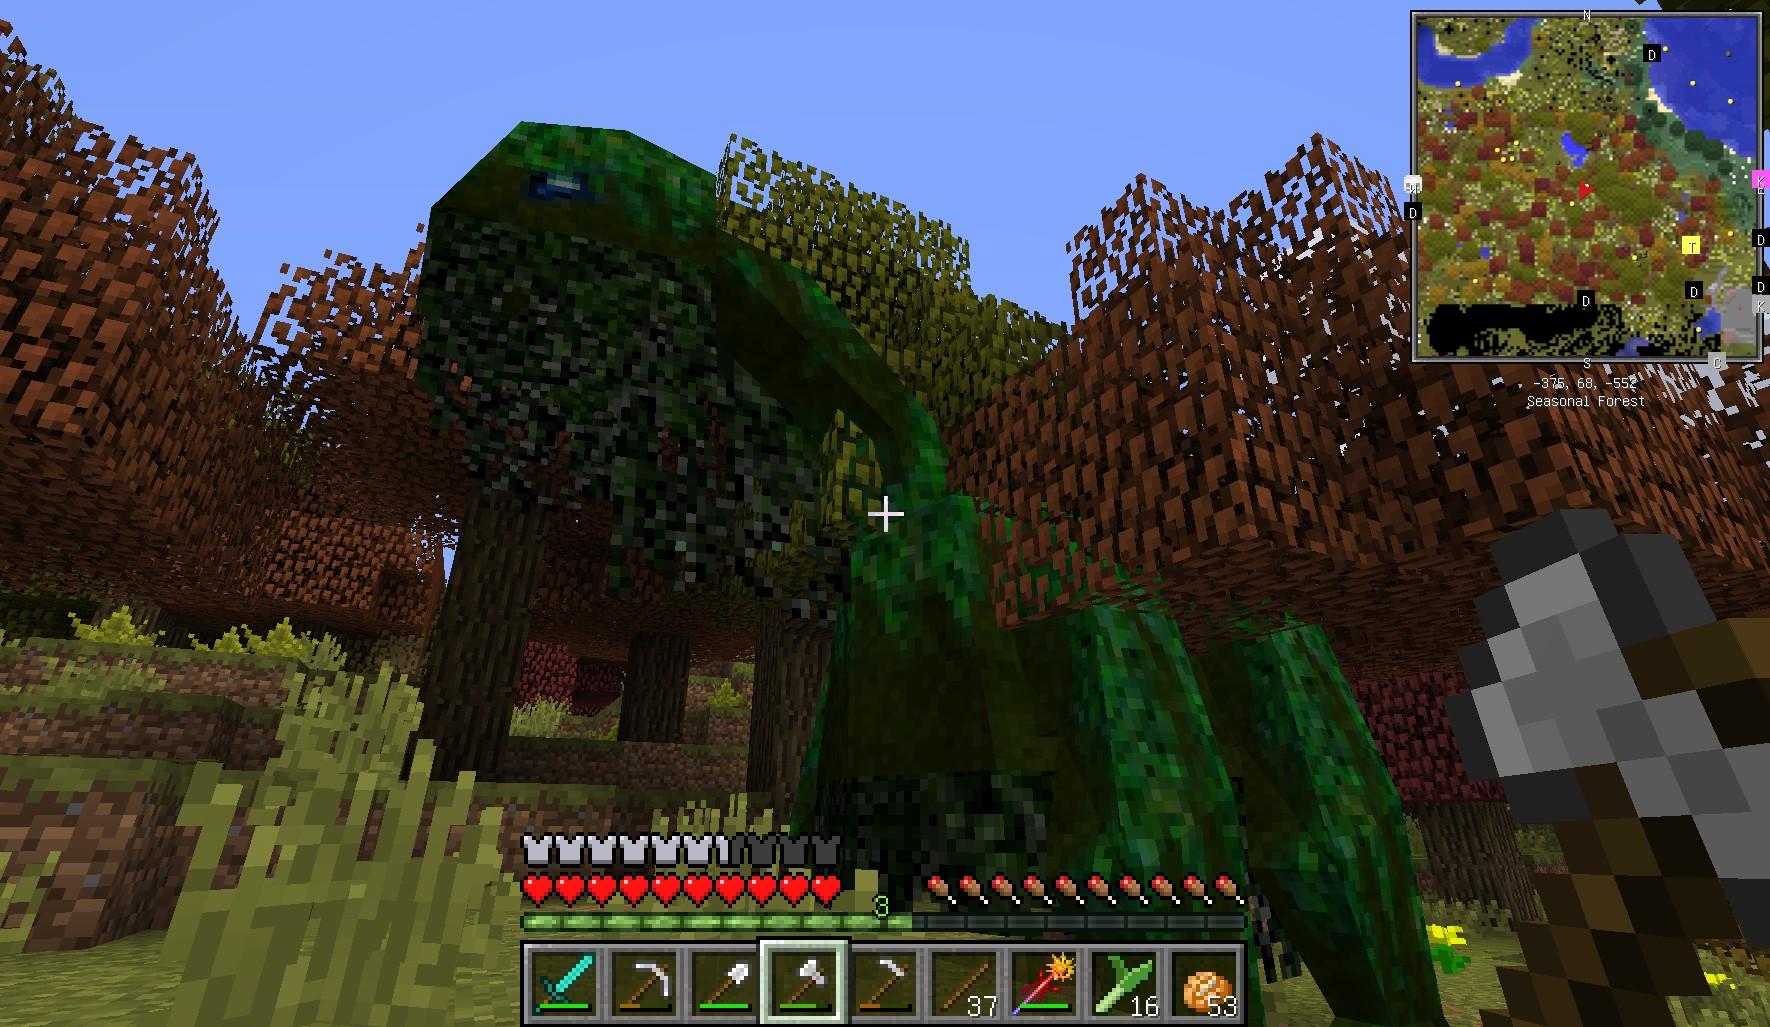 minecraft_053.jpg